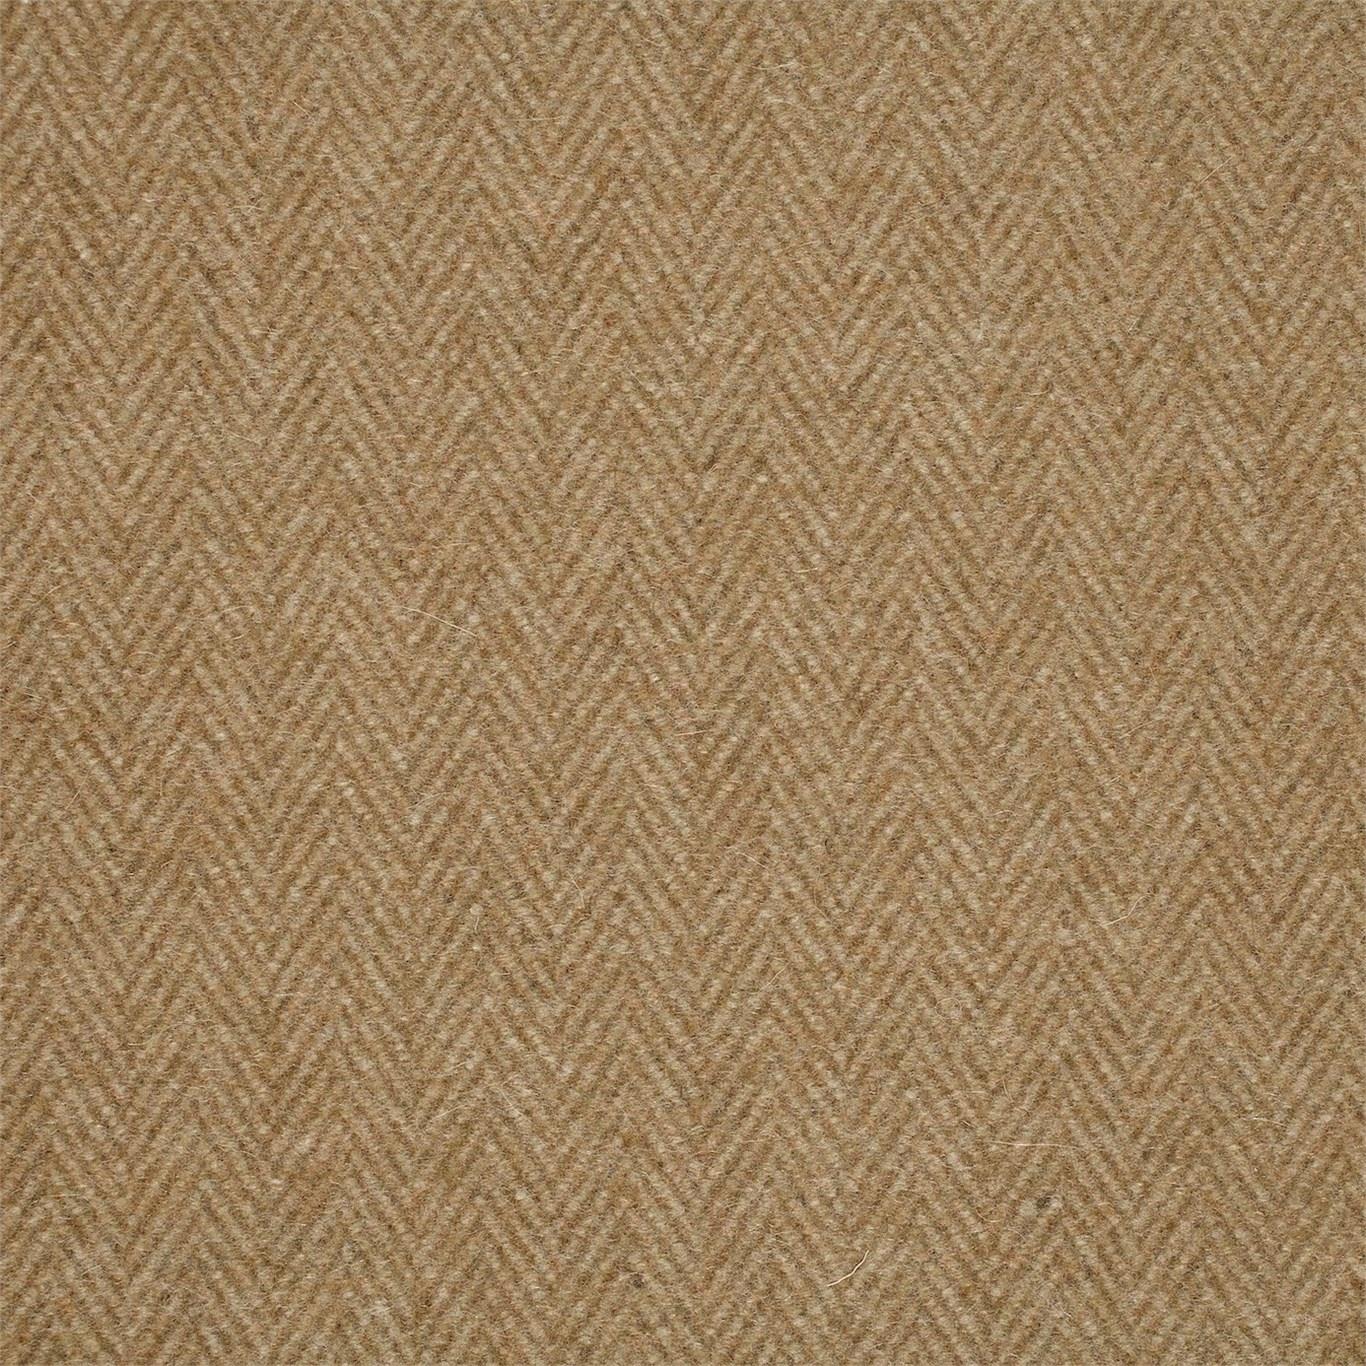 Image of Sanderson Portland Caramel Fabric 233238